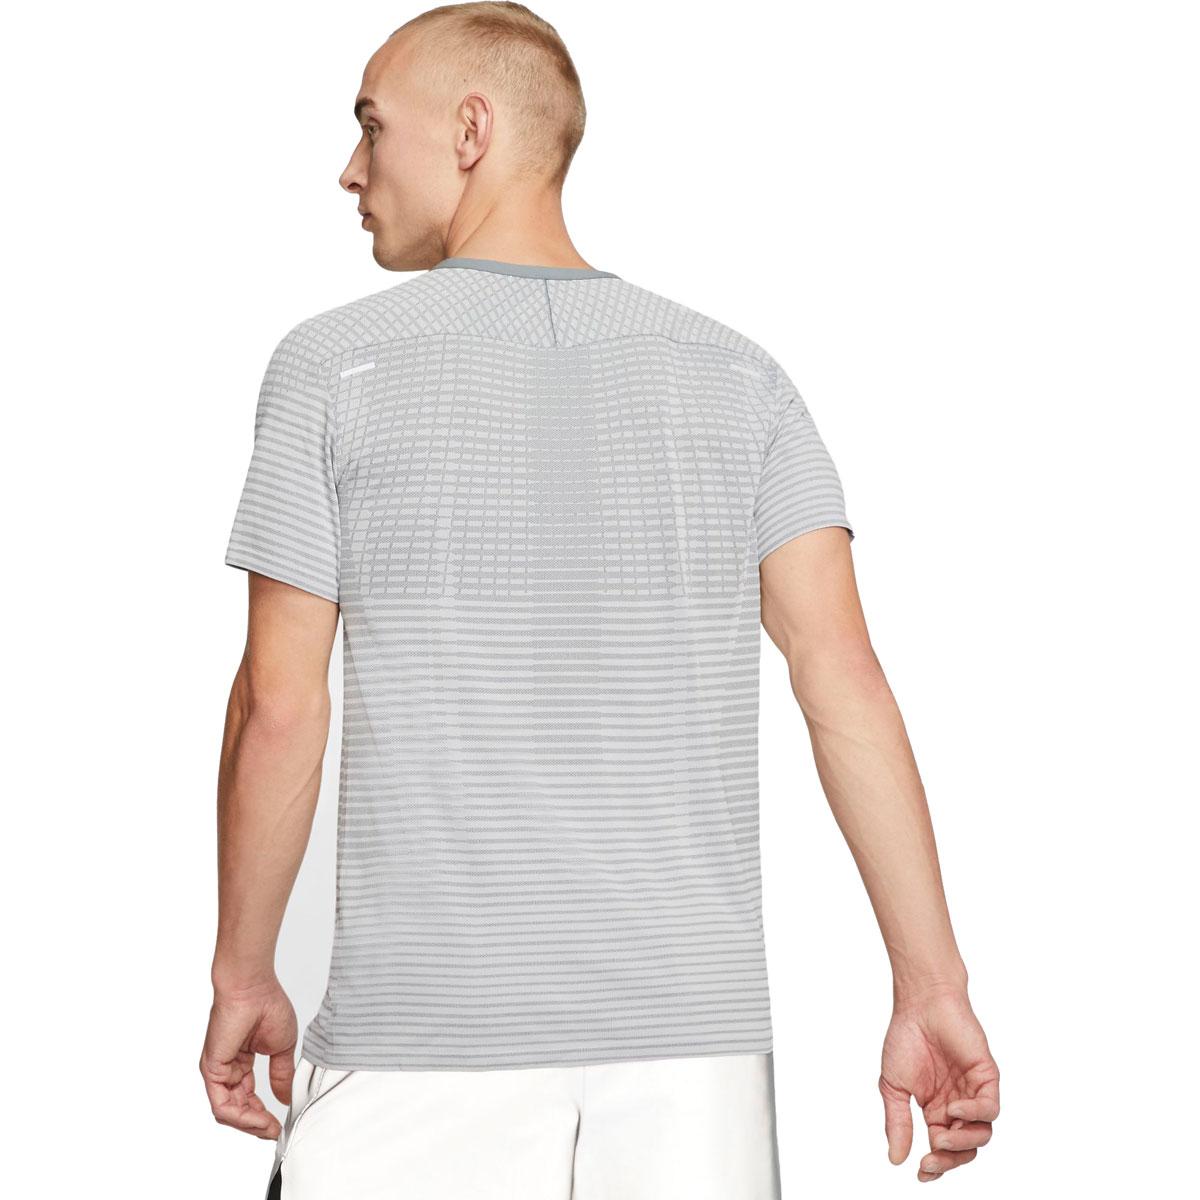 Men's Nike TechKnit Ultra Running Top - Color: Smoke Grey/Lt Smoke Grey/Reflective Silver - Size: M, Smoke Grey/Light Smoke Grey/Reflective Silver, large, image 2